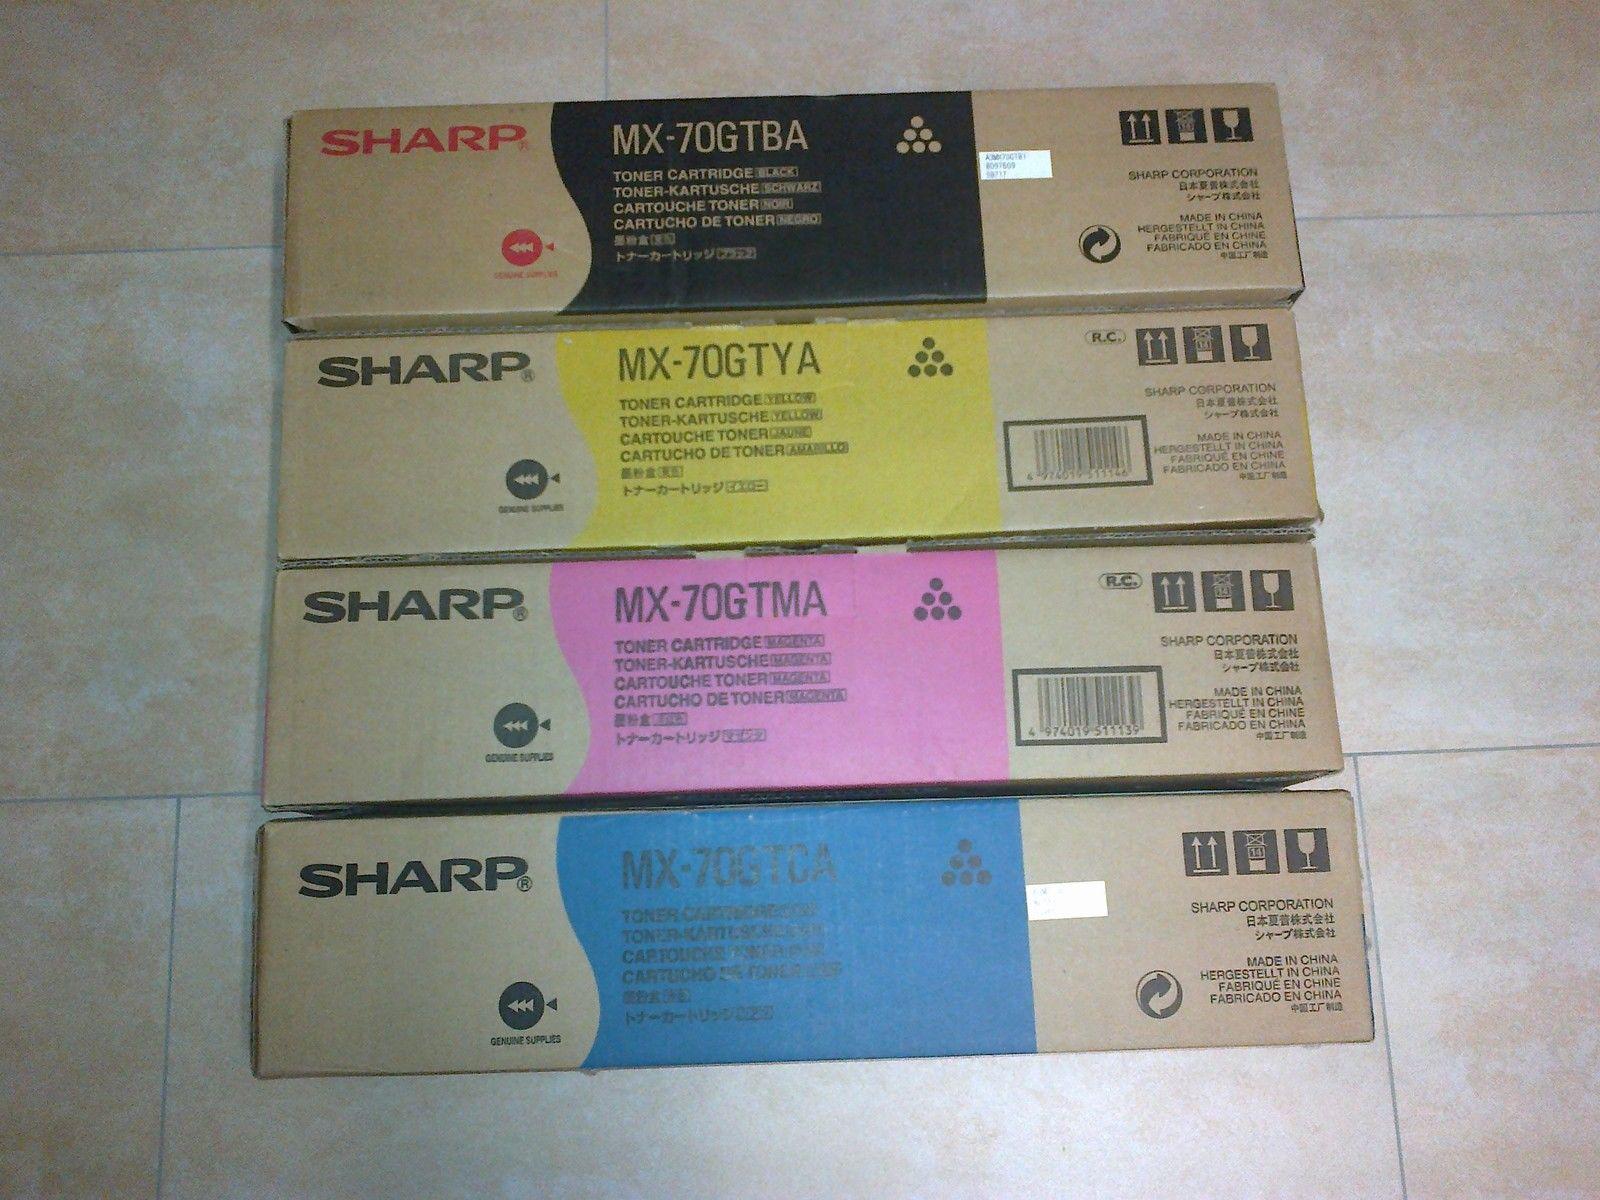 Sharp MX-70GTCA toner cyano durata 32.000p